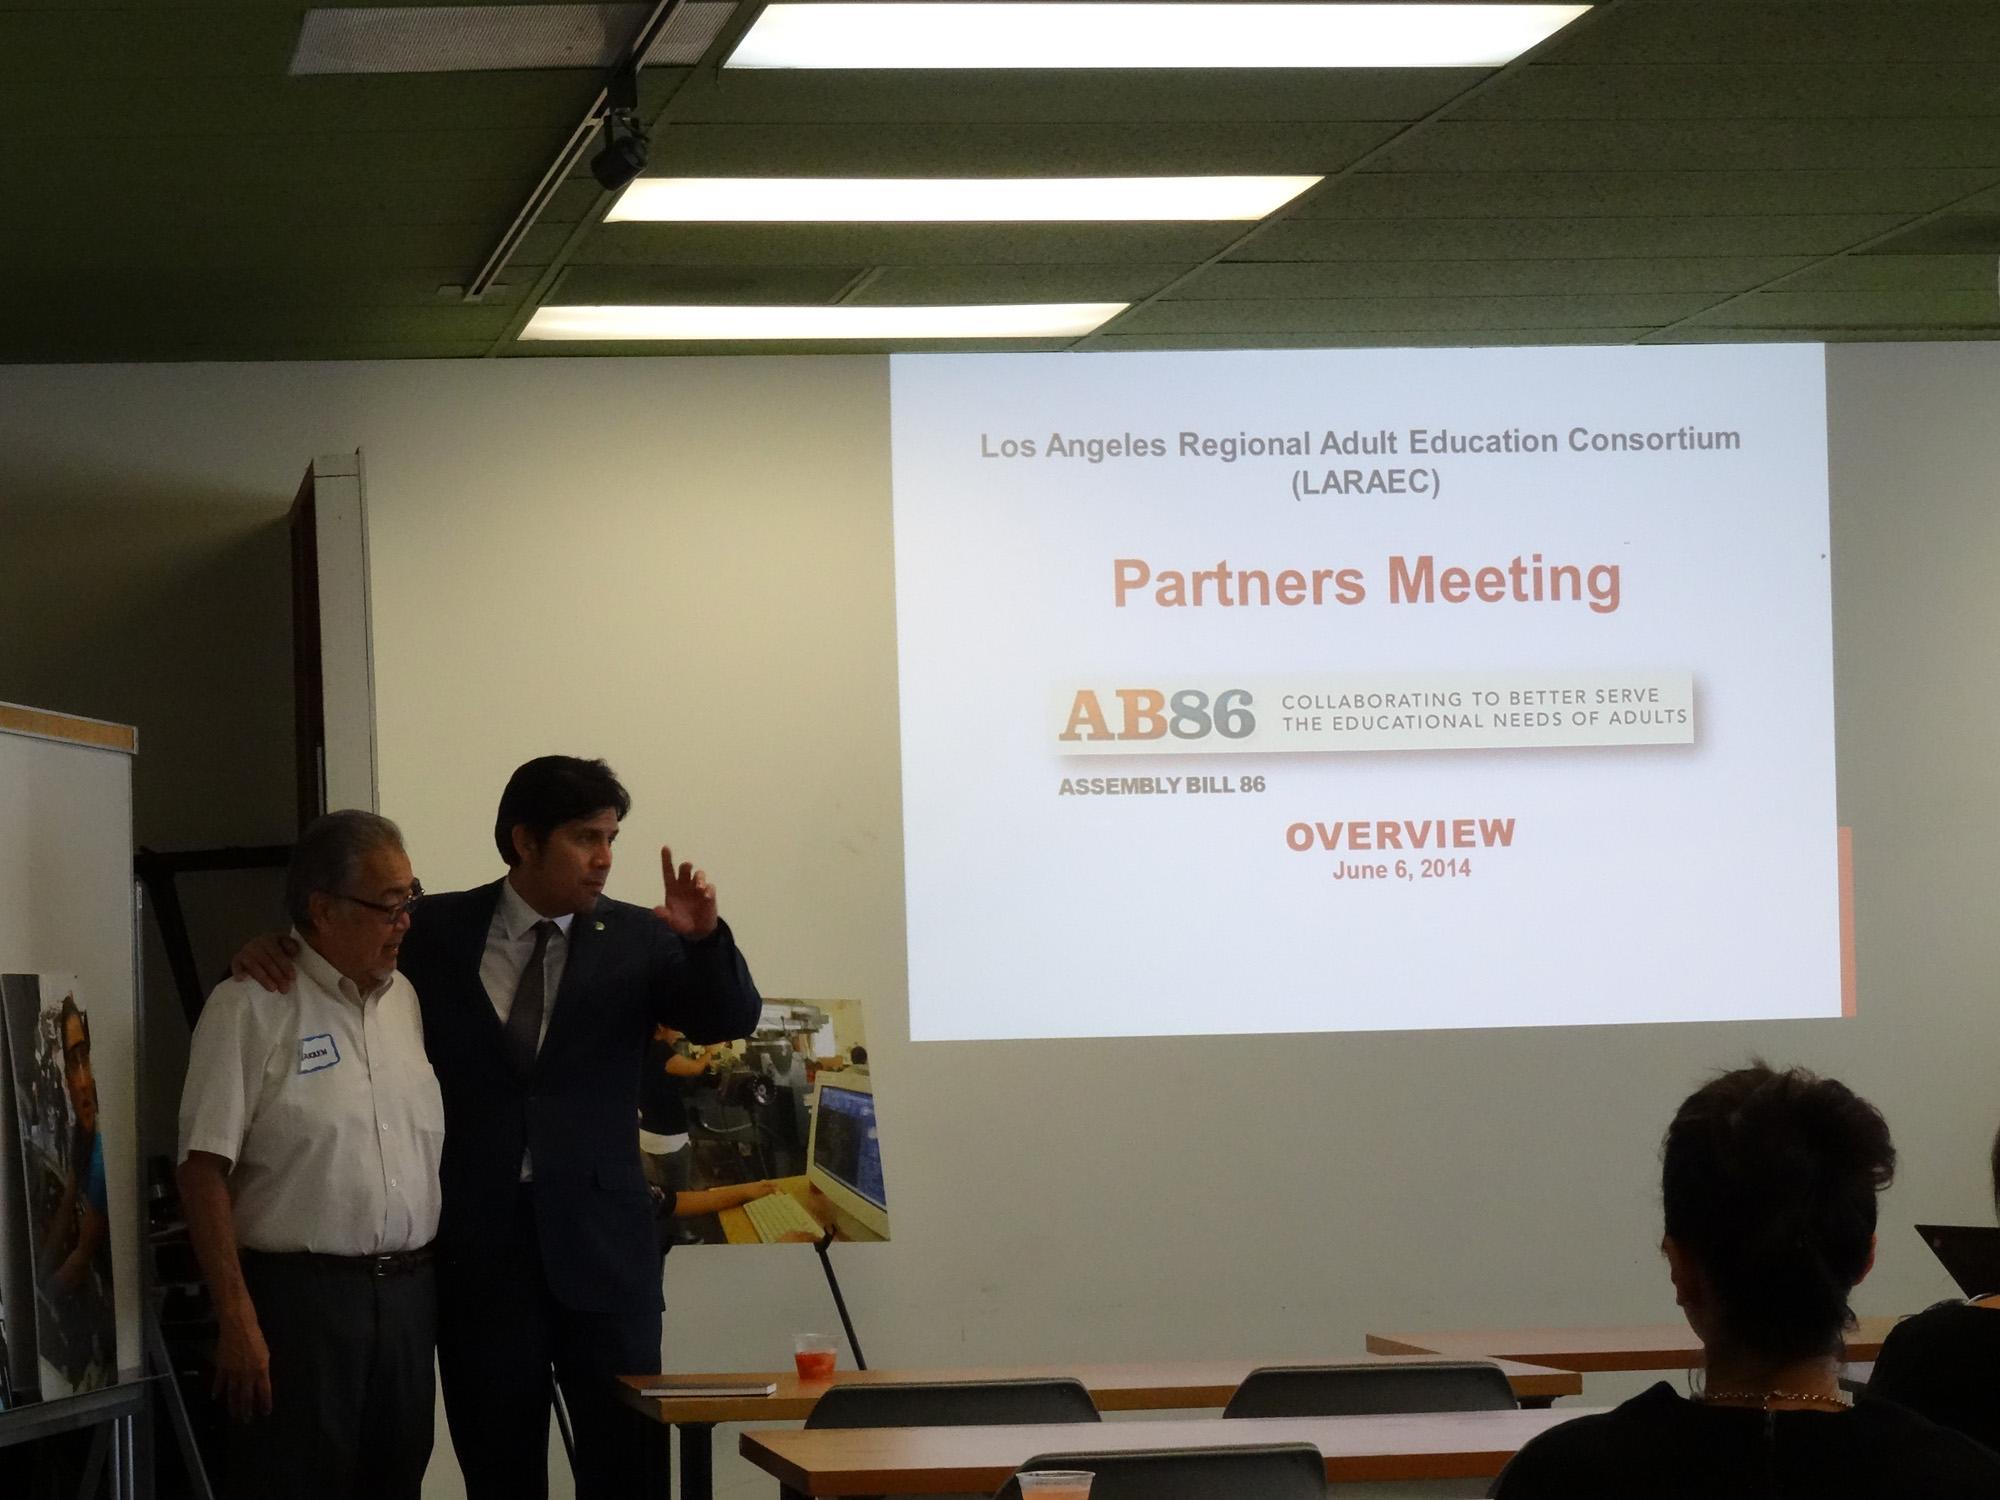 LARAEC-Partners-Meeting-06-06-14-15